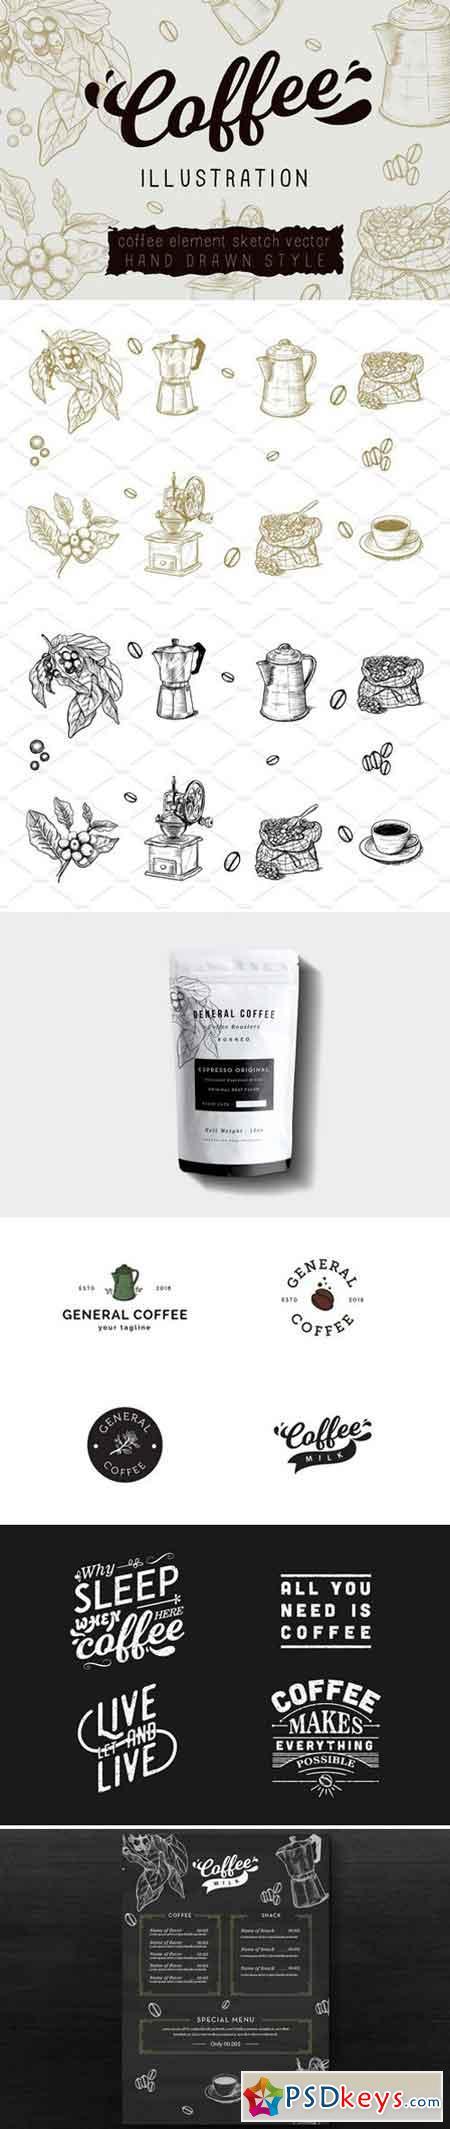 Coffee Vector Illustration 2423932